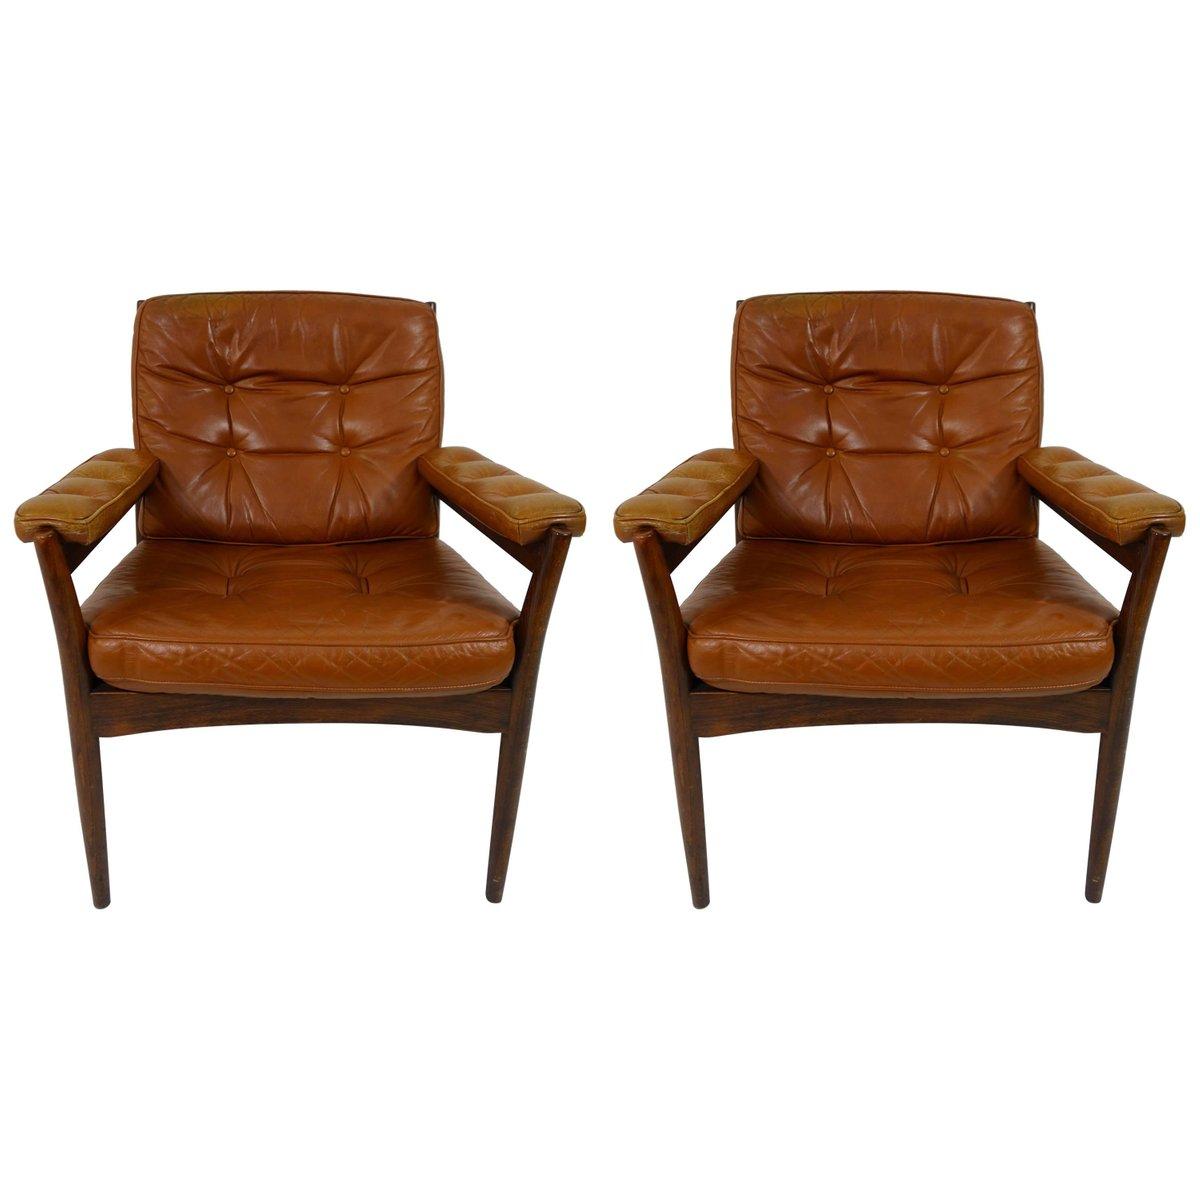 mid century armlehnsessel aus holz leder von gote m bel 2er set bei pamono kaufen. Black Bedroom Furniture Sets. Home Design Ideas